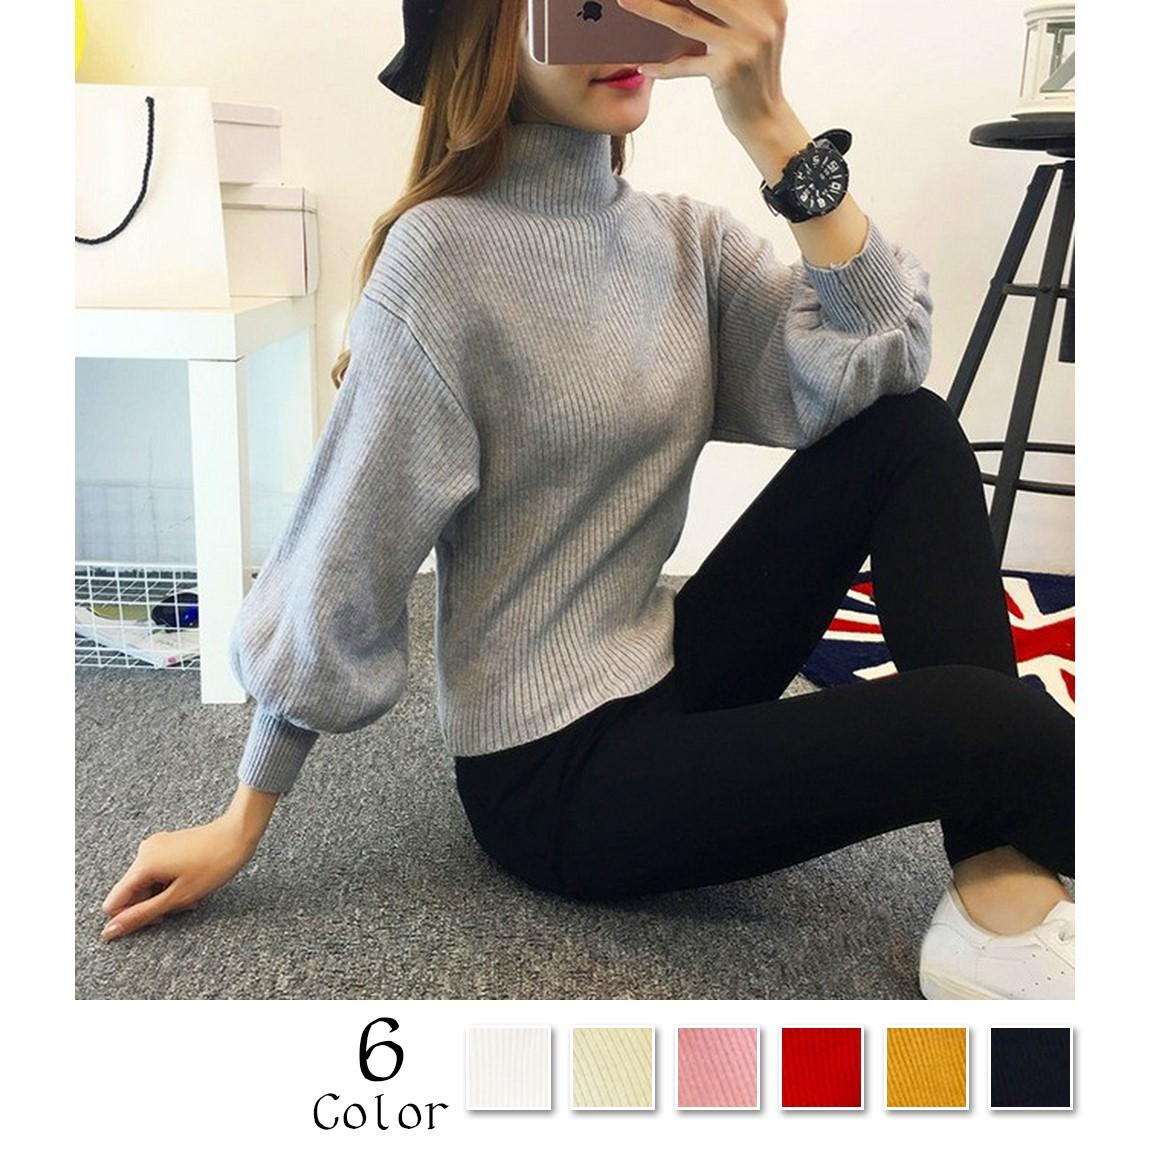 セーター◆全7色◆gg110991a【2016秋冬商品】